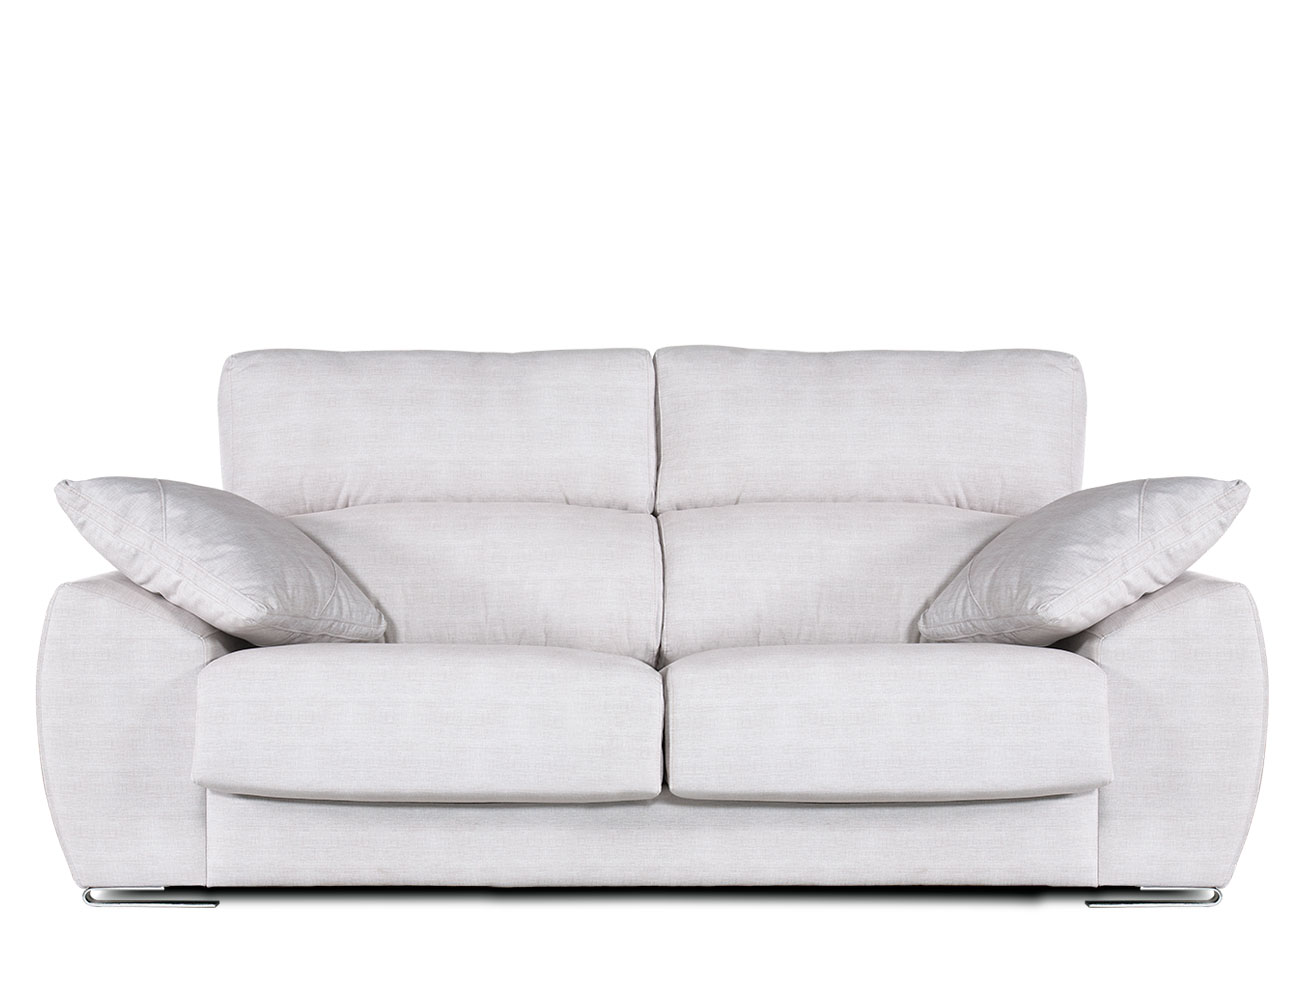 Sof chaislongue rinconera extraible y reclinable con dise o moderno 16547 factory del - Sofa rinconera moderno ...